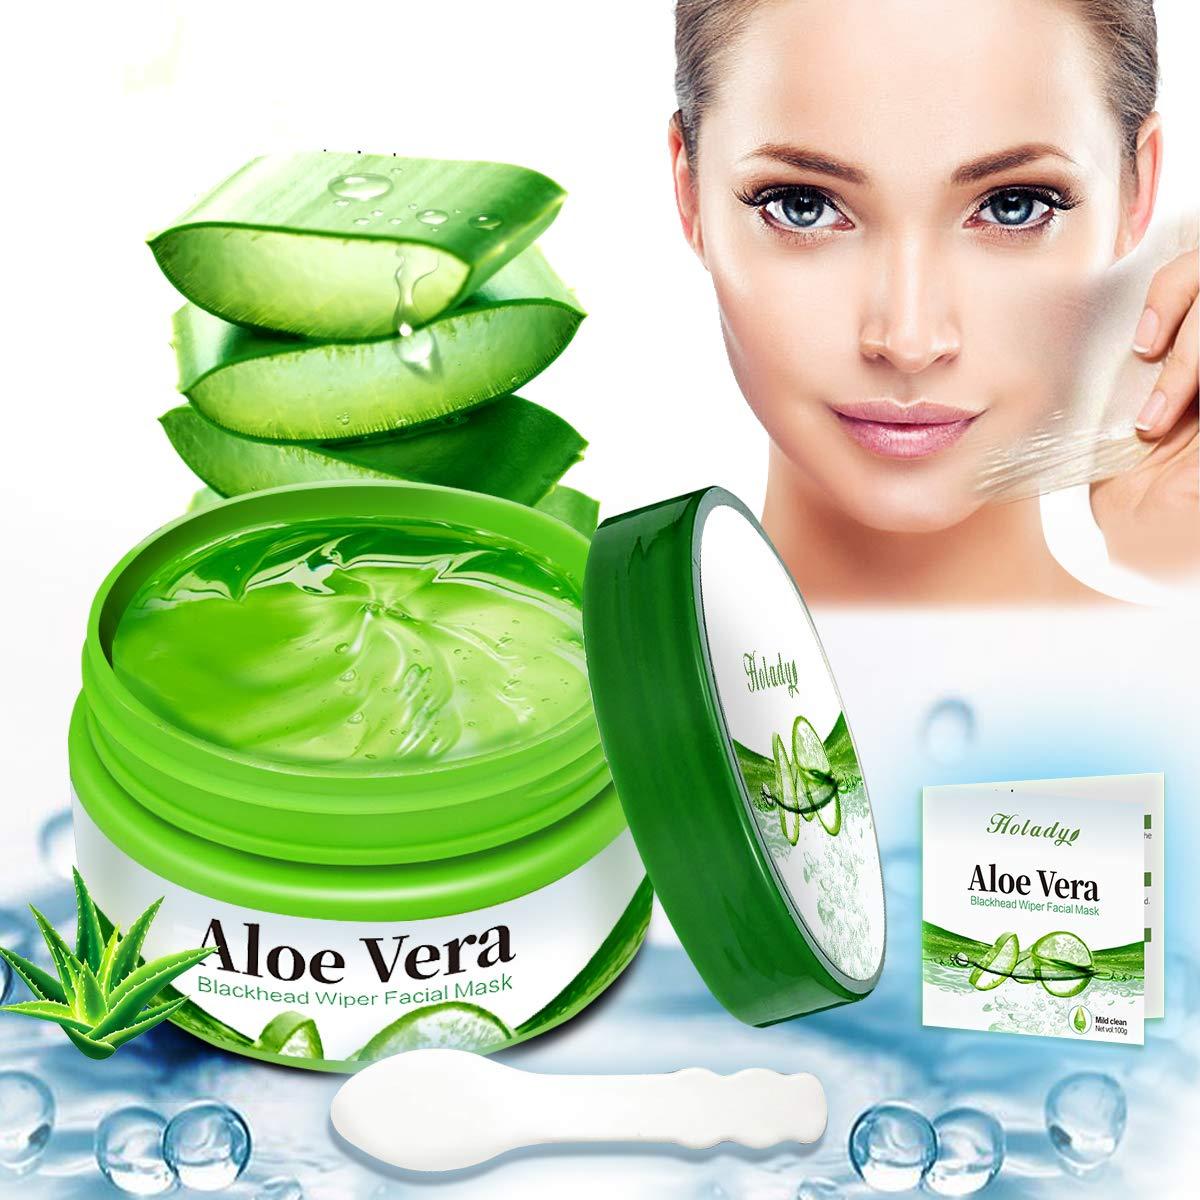 Aloe Vera Peel Off Blackhead Remover Mask-Facial Mask-Peel off Face Masks-Aloe Vera Extract Facial Mask- Oil Control - Facial Moisturizing - Face Whitening - Soothing & Moisture Skin